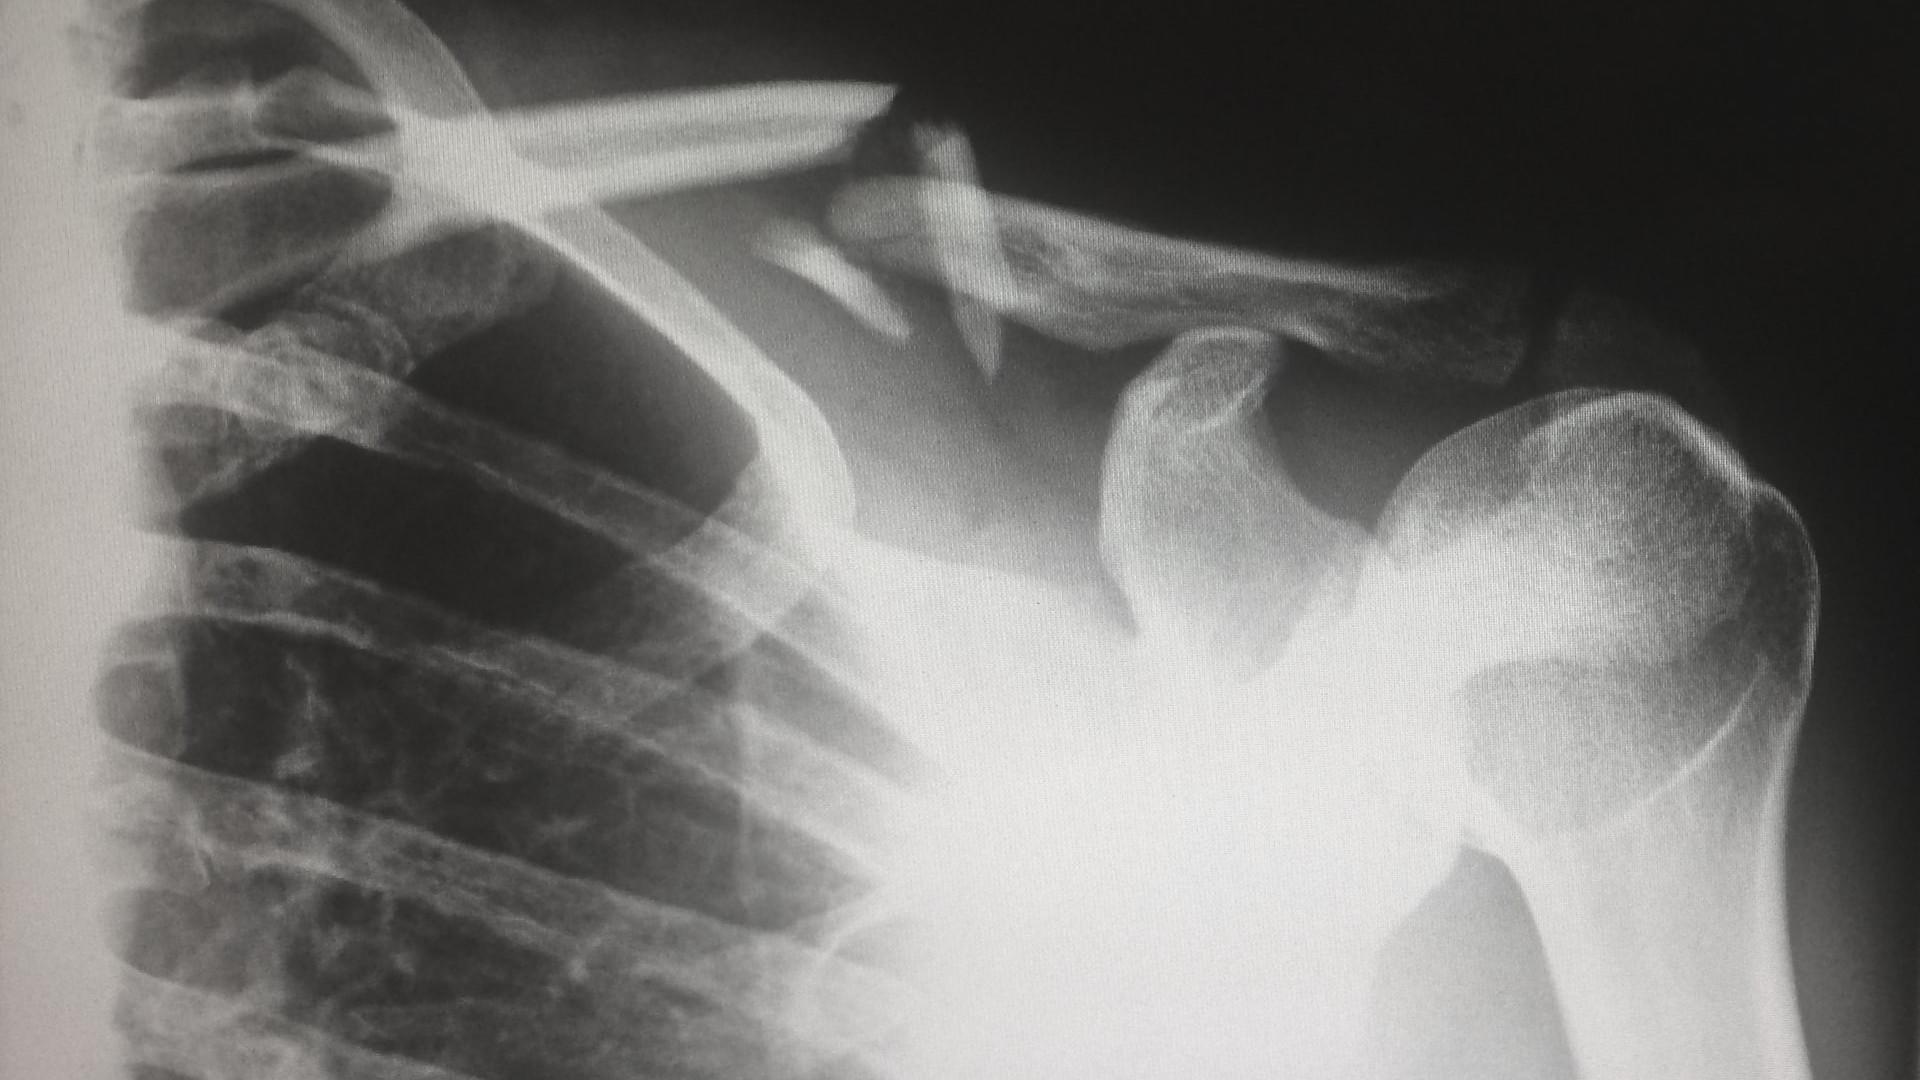 Radiografia lesión clavícula